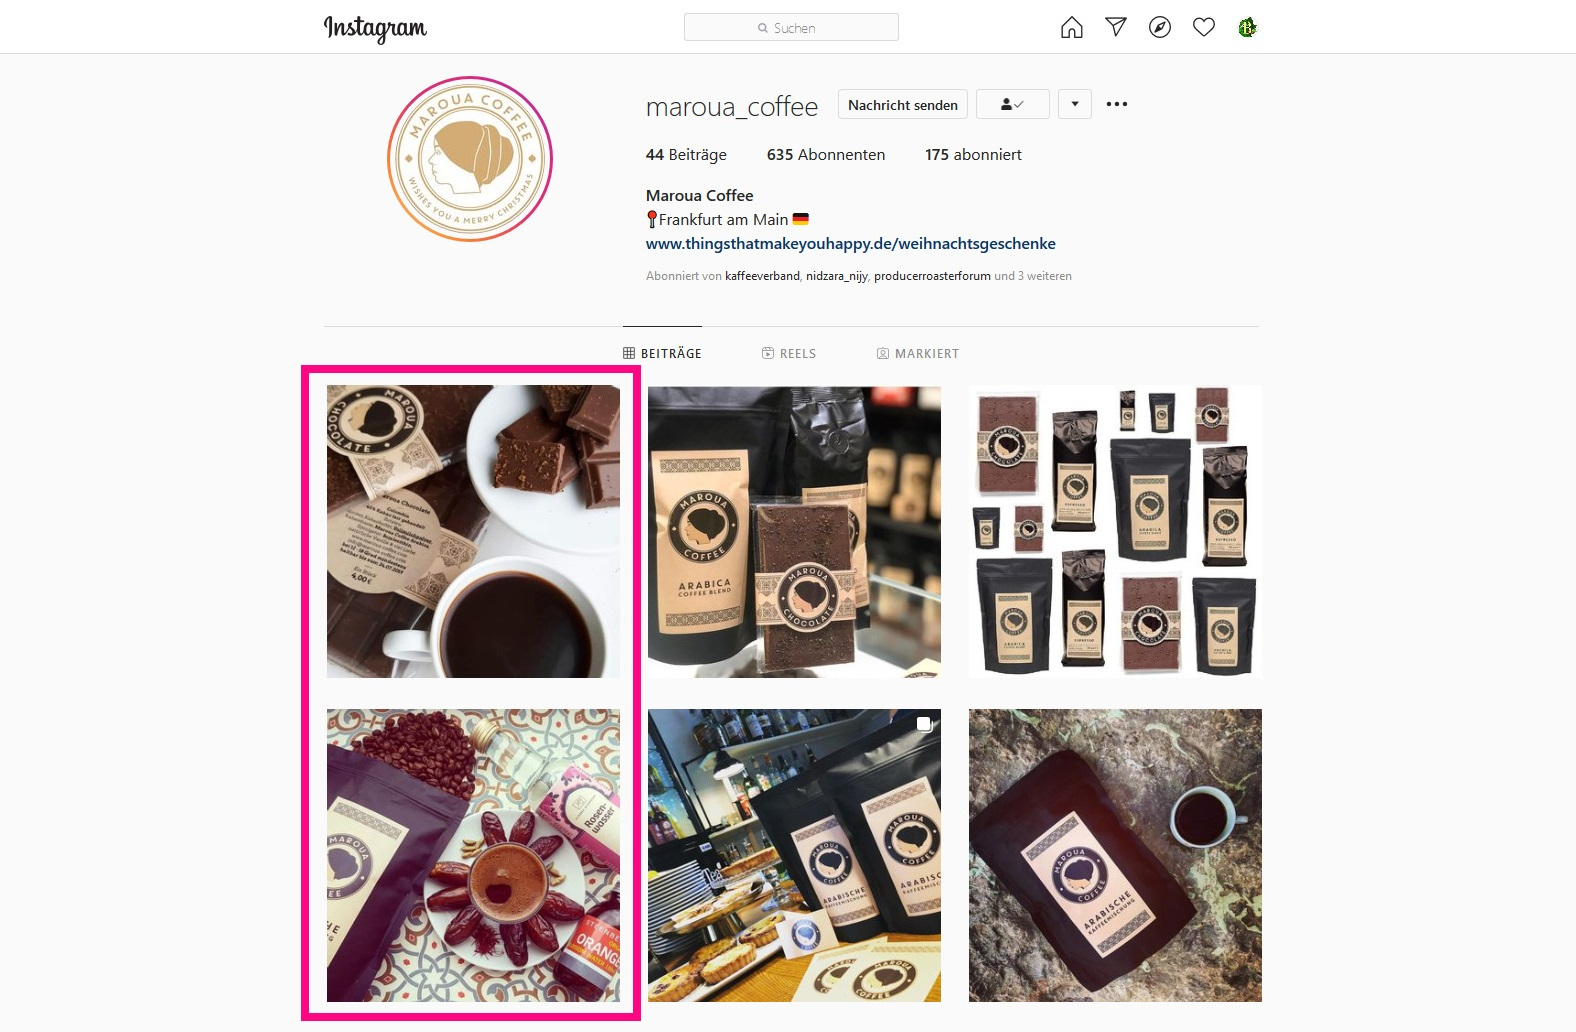 Bunaa - Maroua Coffee Instagram